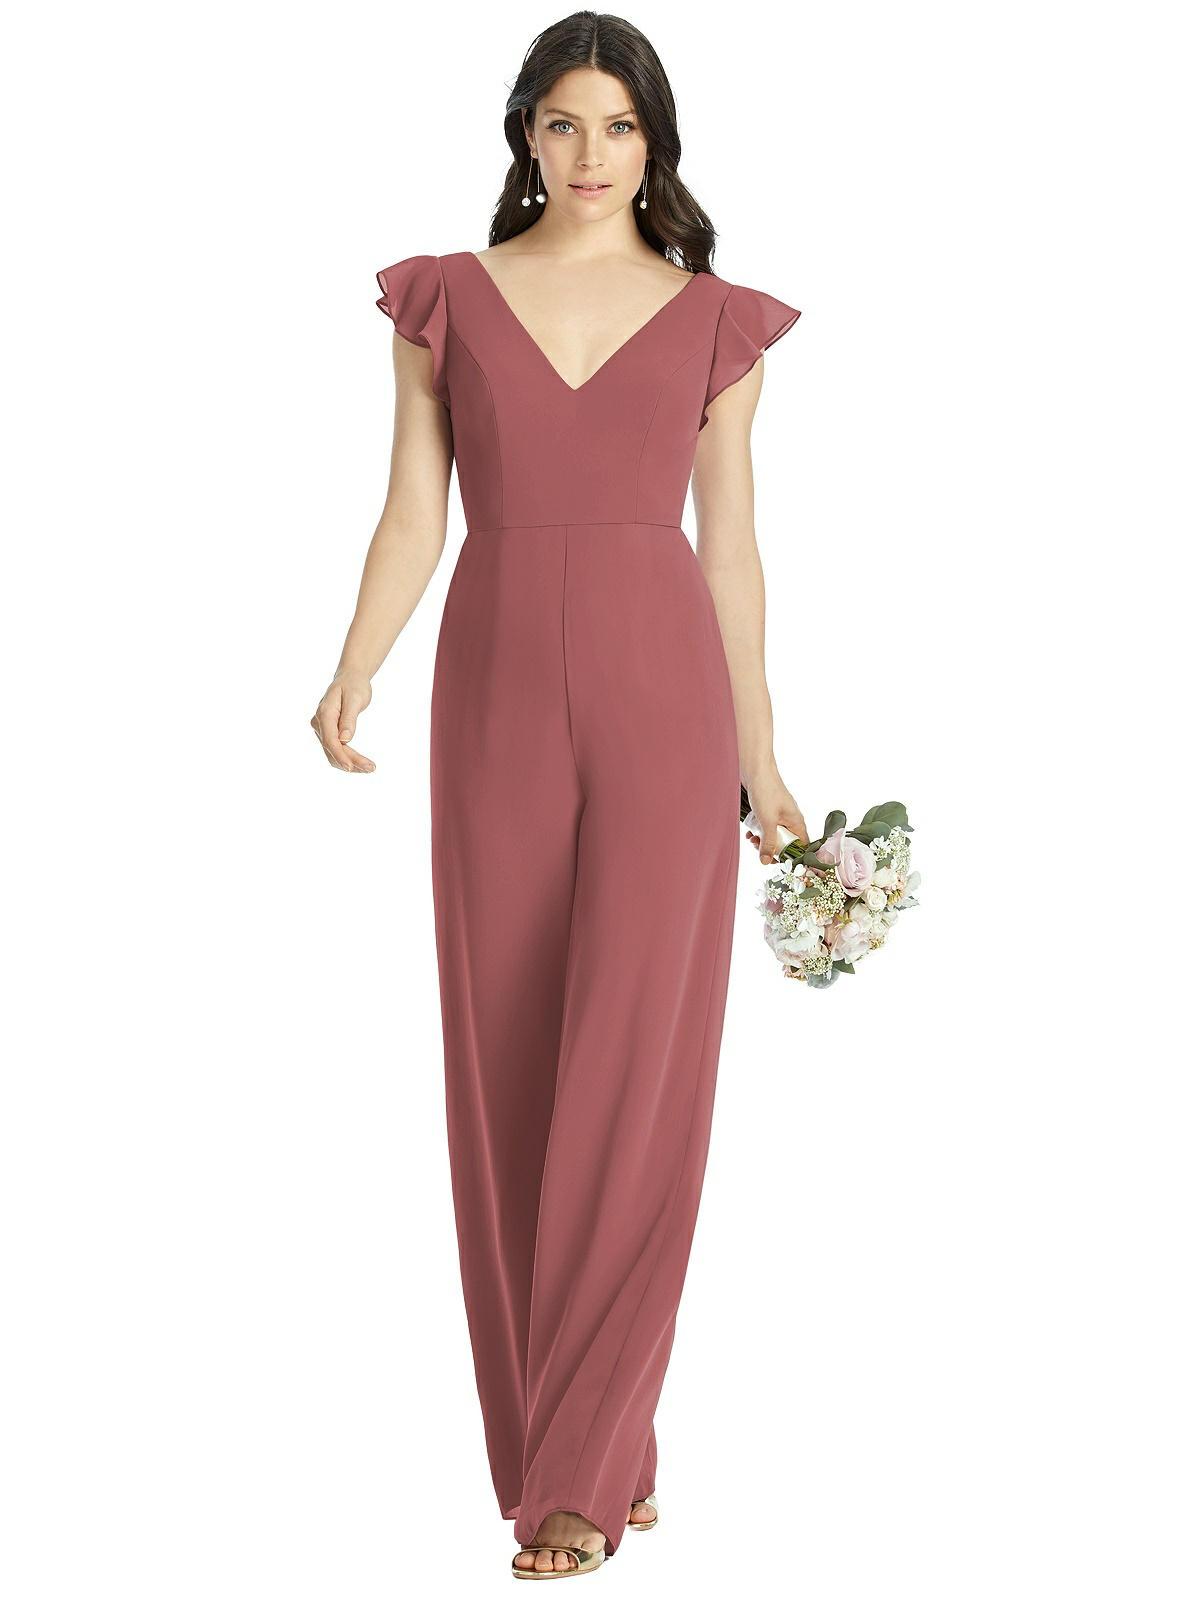 3c0cd7b1032b Blush Wedding Dress Adelaide - raveitsafe